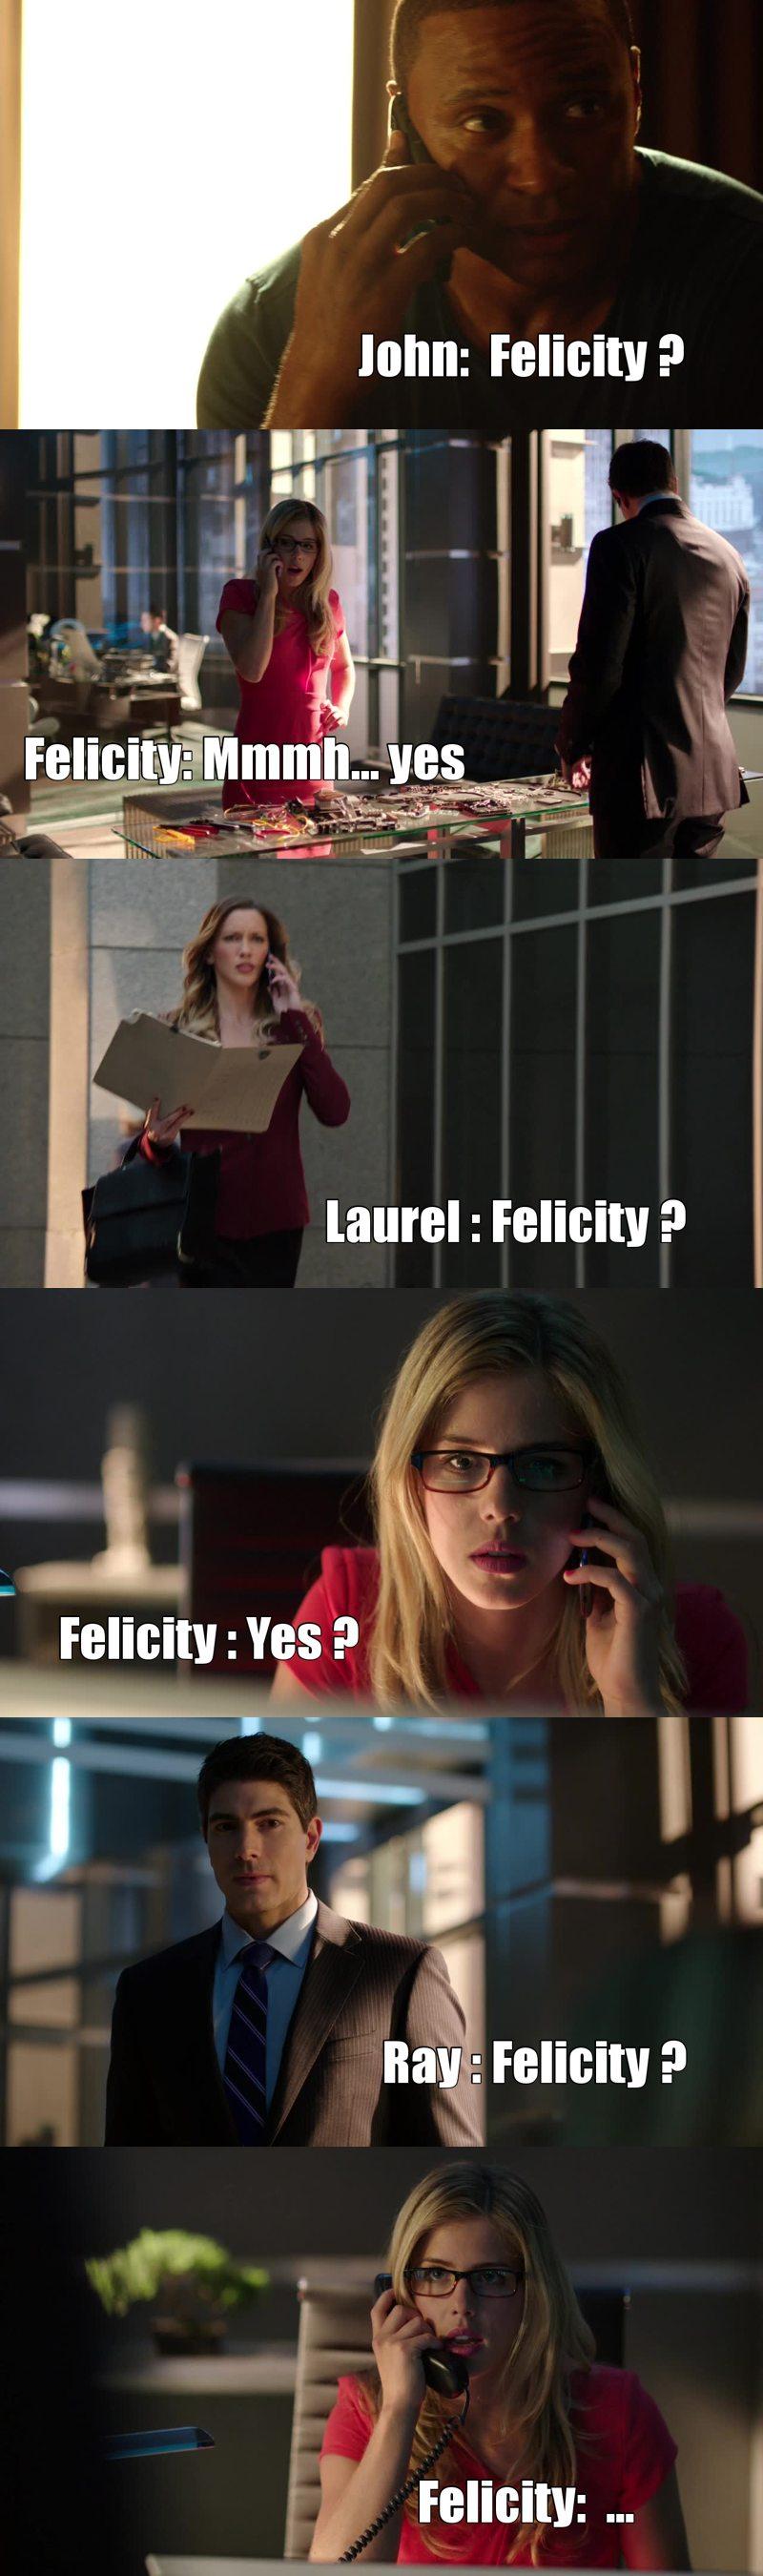 Haha love this moment :D This is a normal day for Felicity !  Haha j'aime ce moment: D C'est un jour normal pour Felicity!